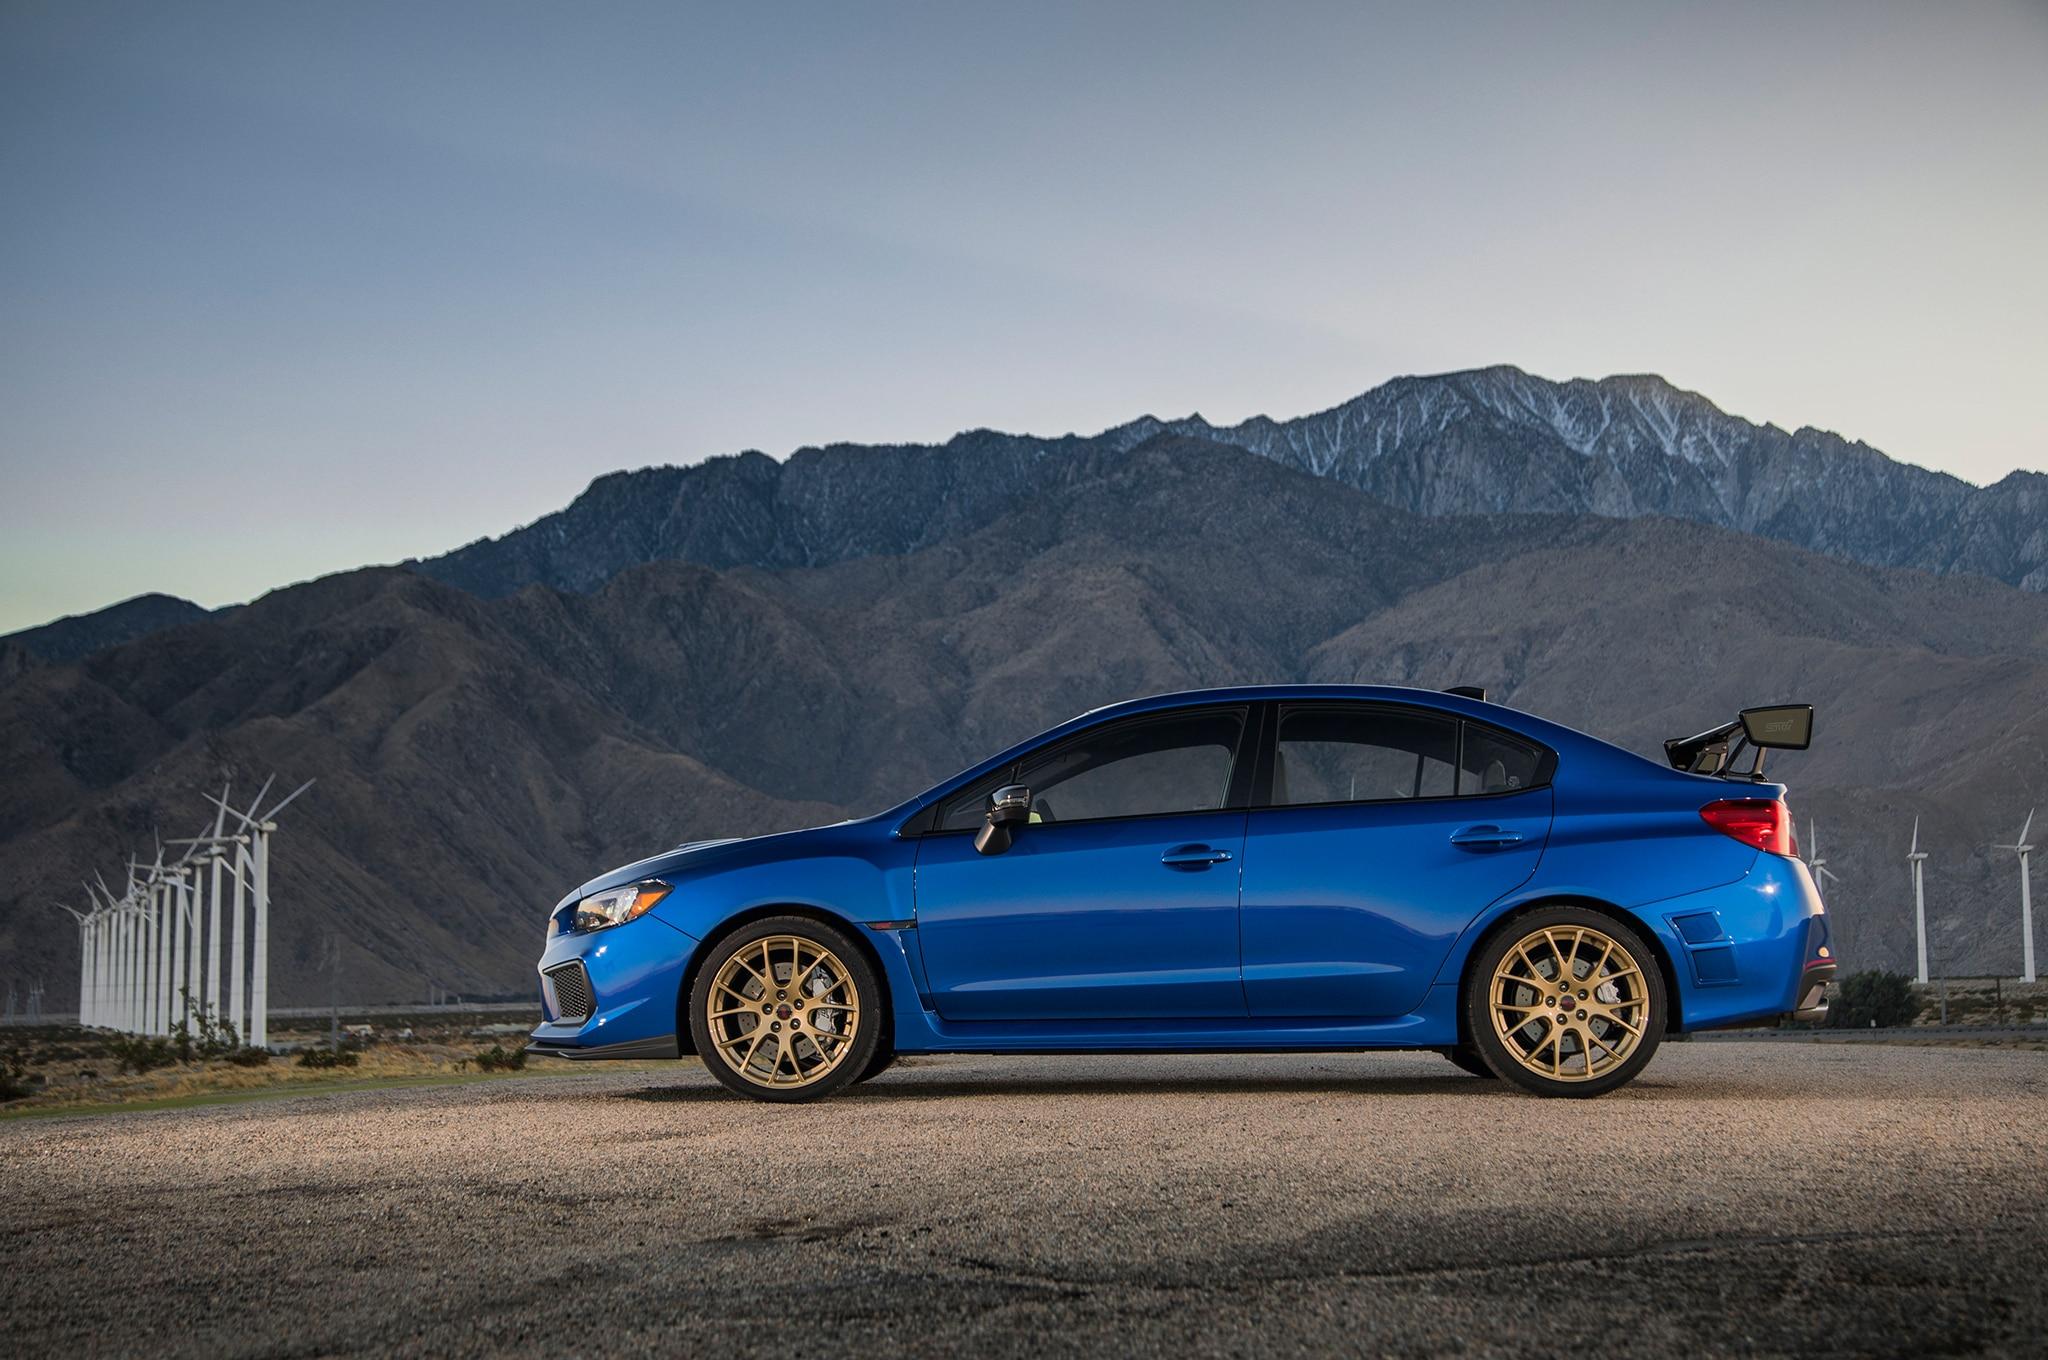 2018 Subaru Wrx Sti Type Ra First Drive Review Automobile Magazine